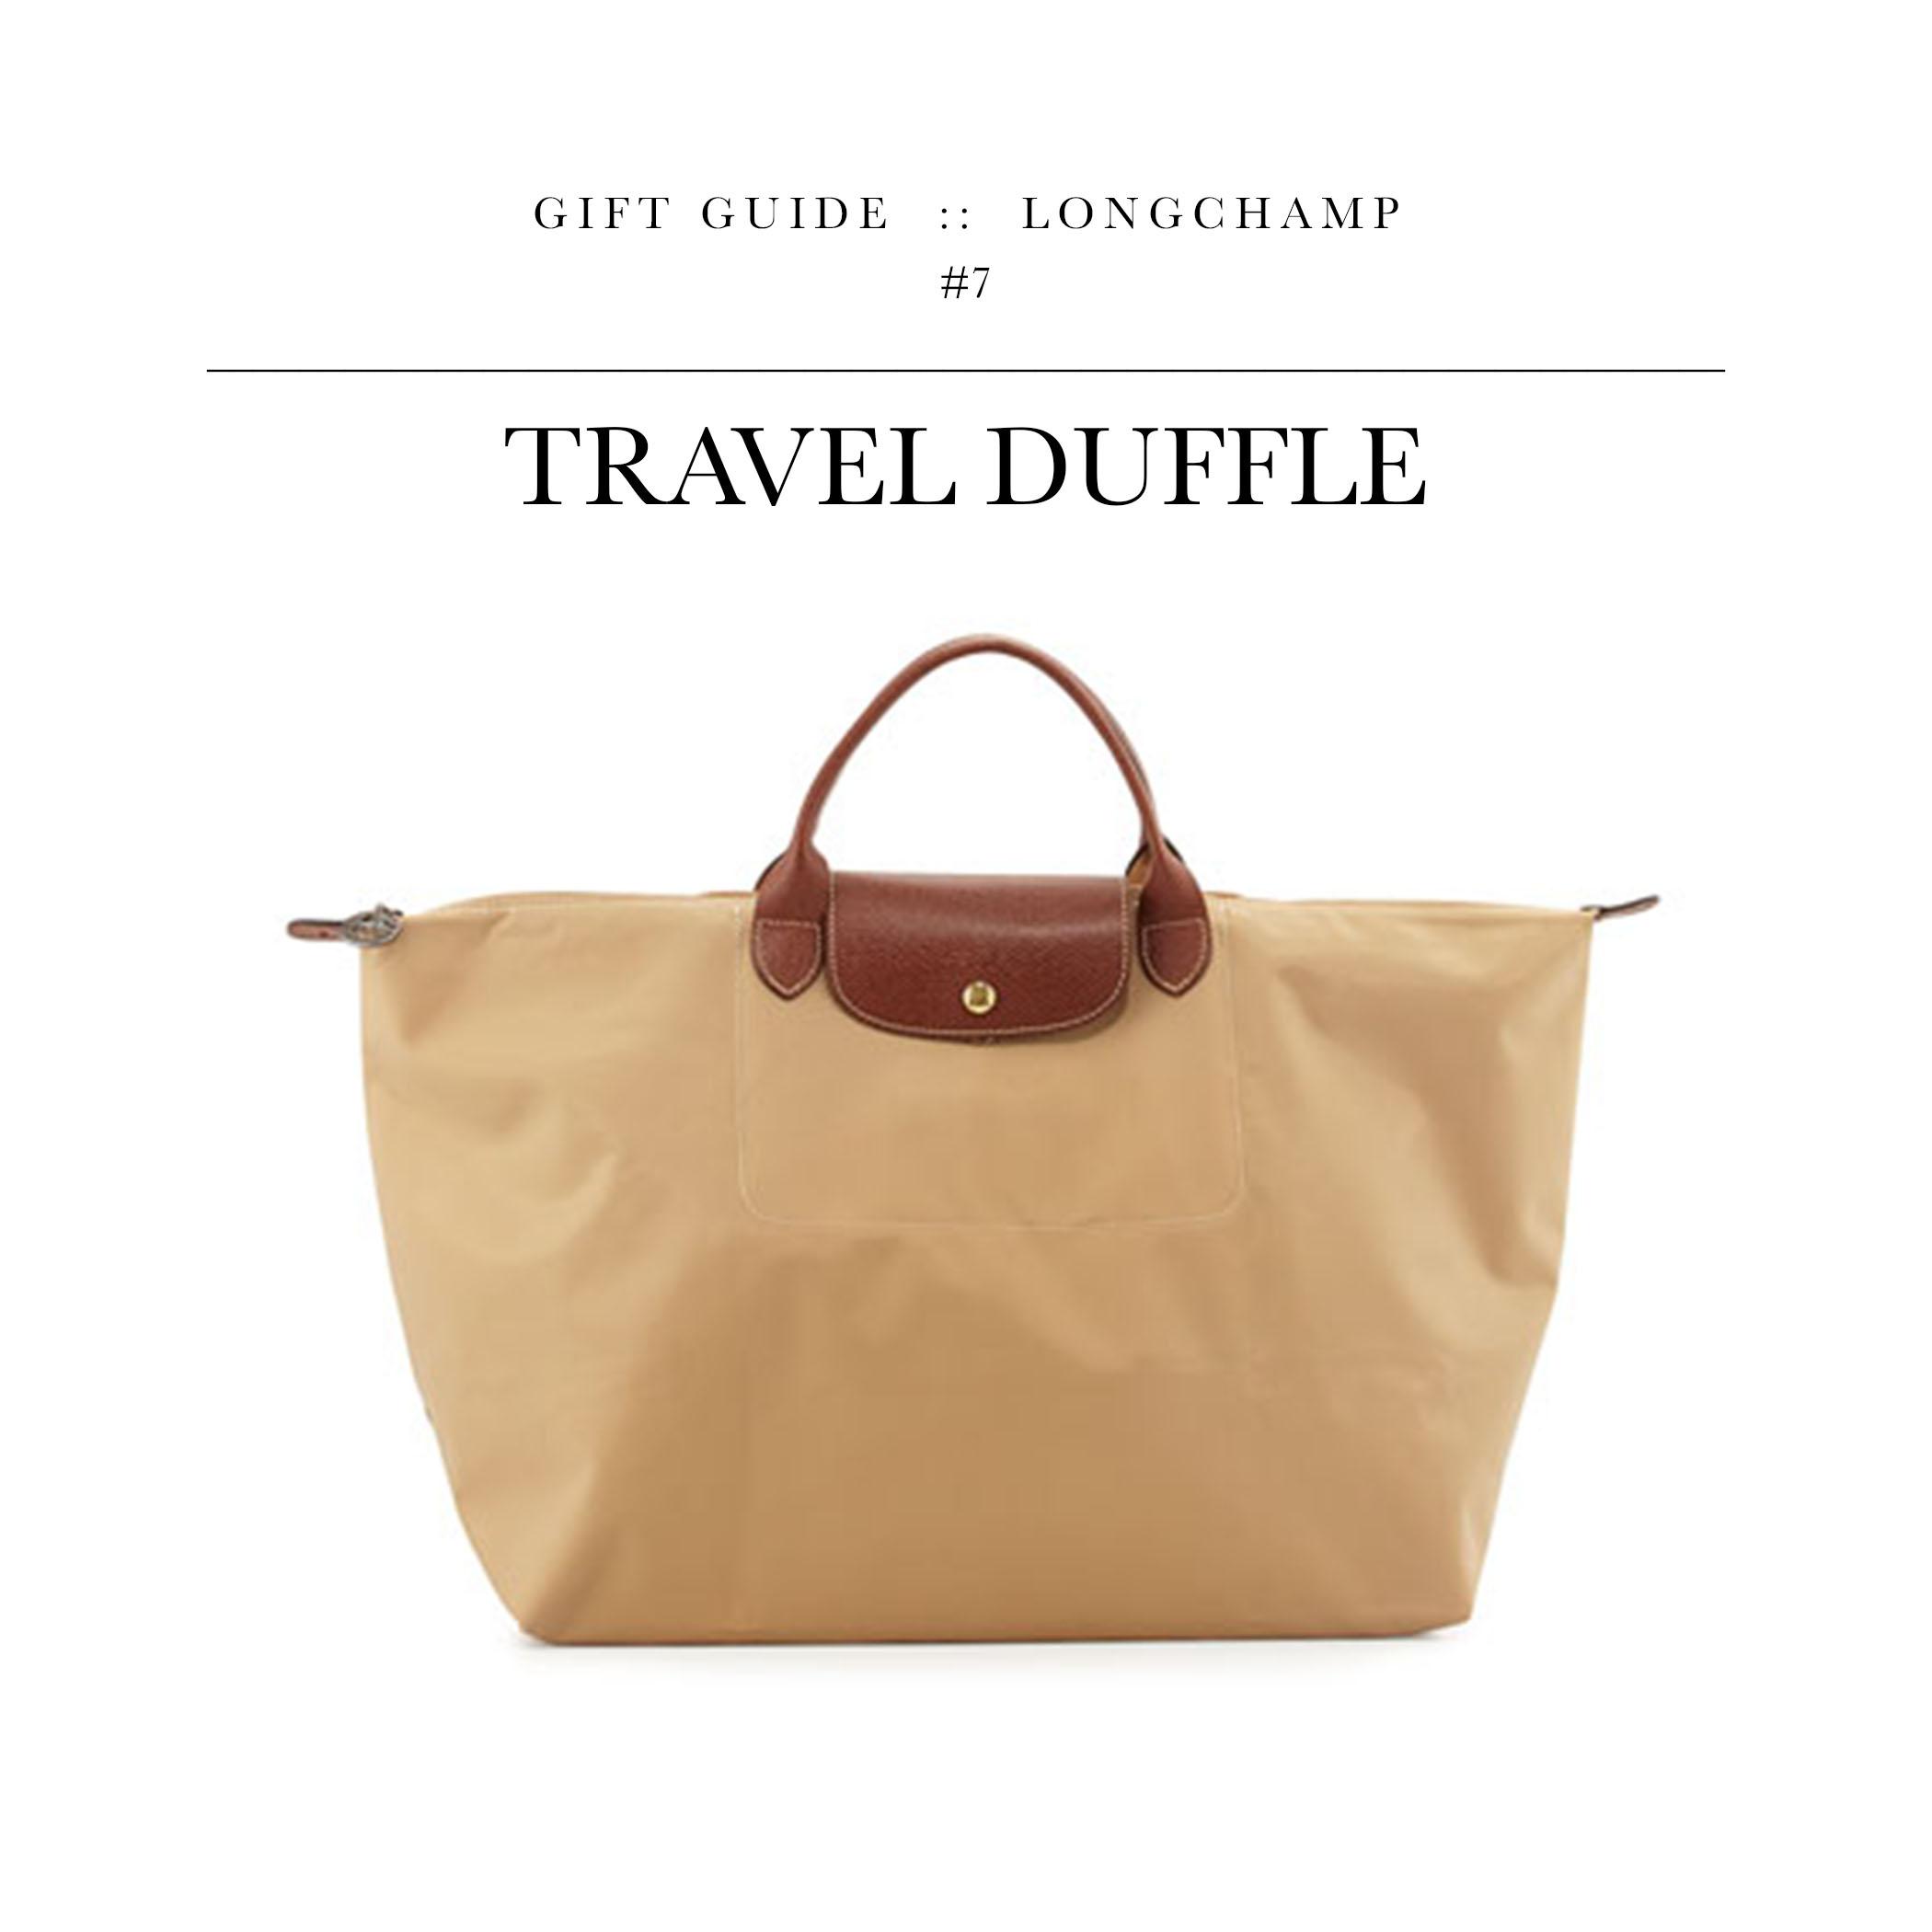 Travel Duffle  via Longchamp //A weekender that won't murder your bank account.